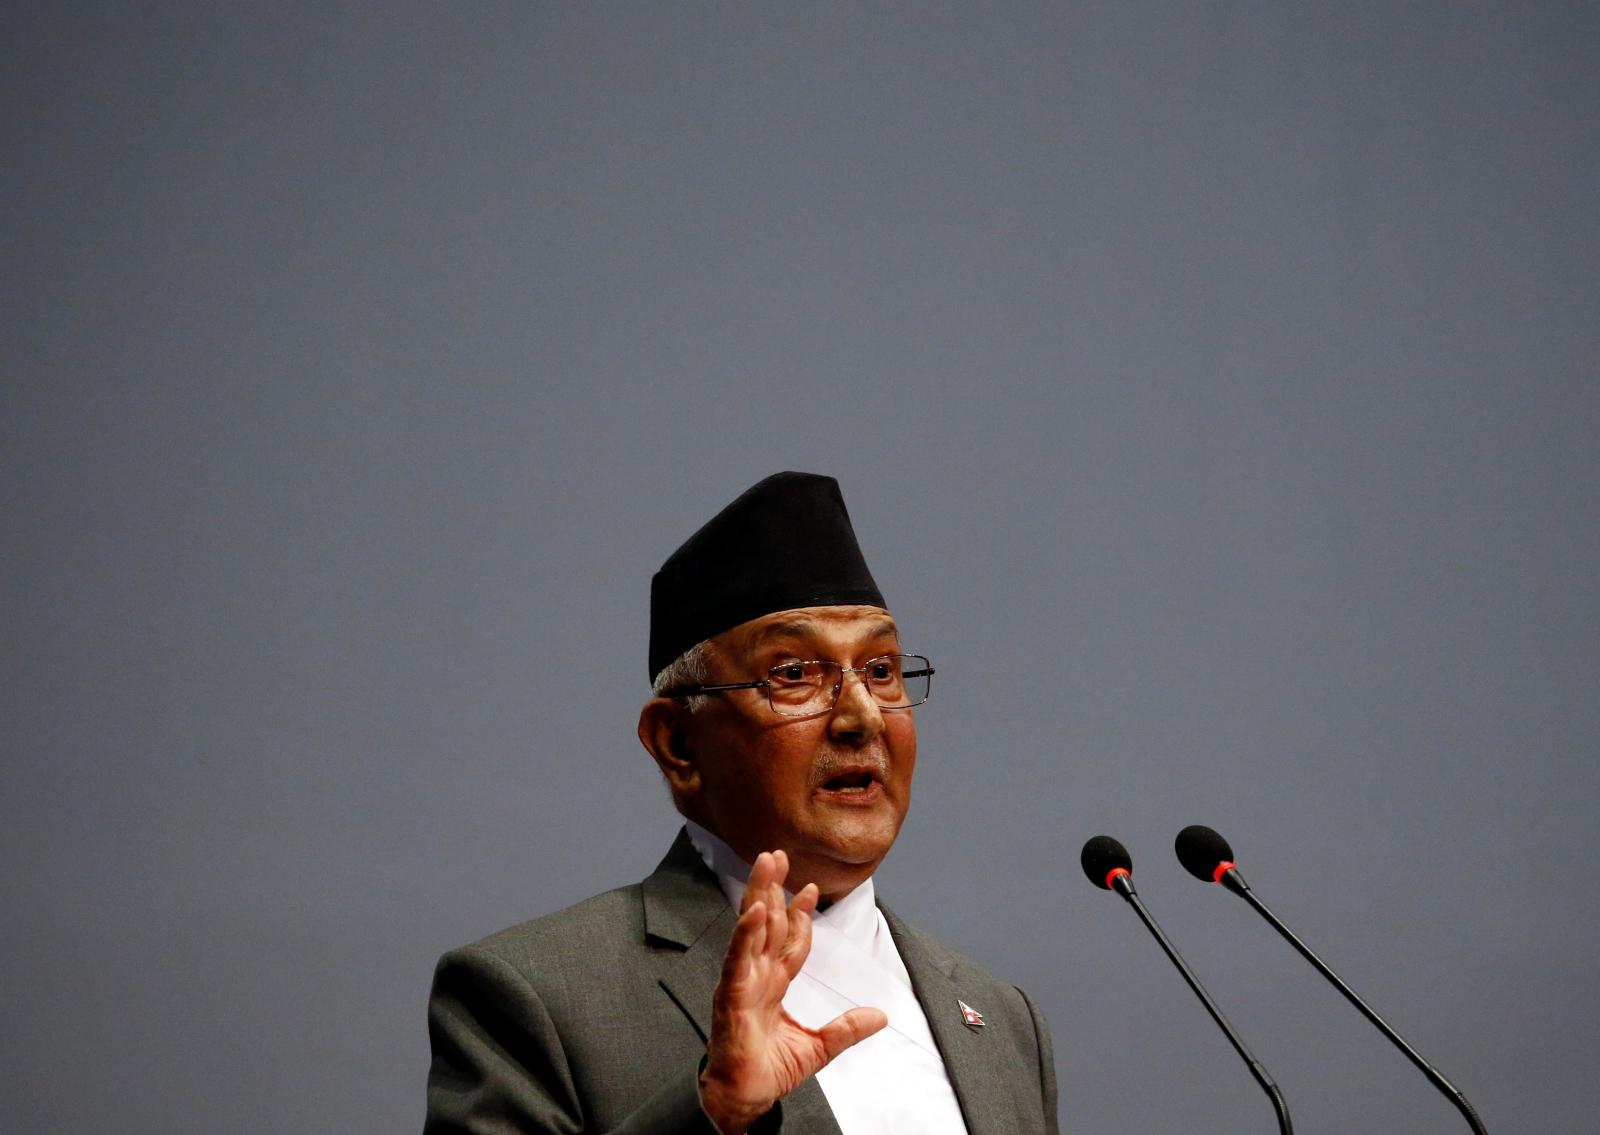 Nepal's Prime Minister Khadga Prasad Sharma Oli